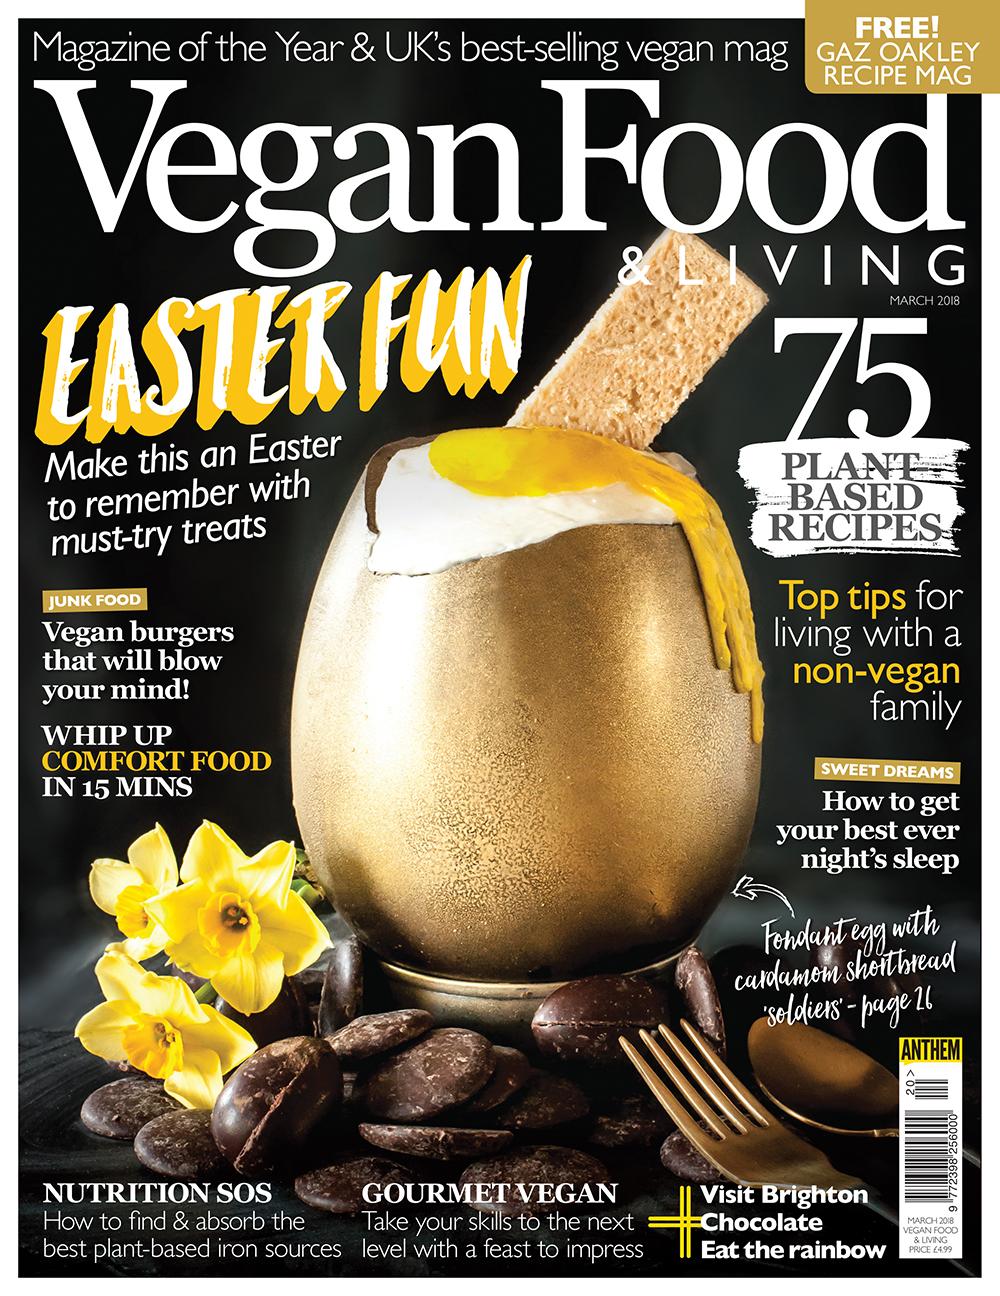 Vegan Food & Living March 2018